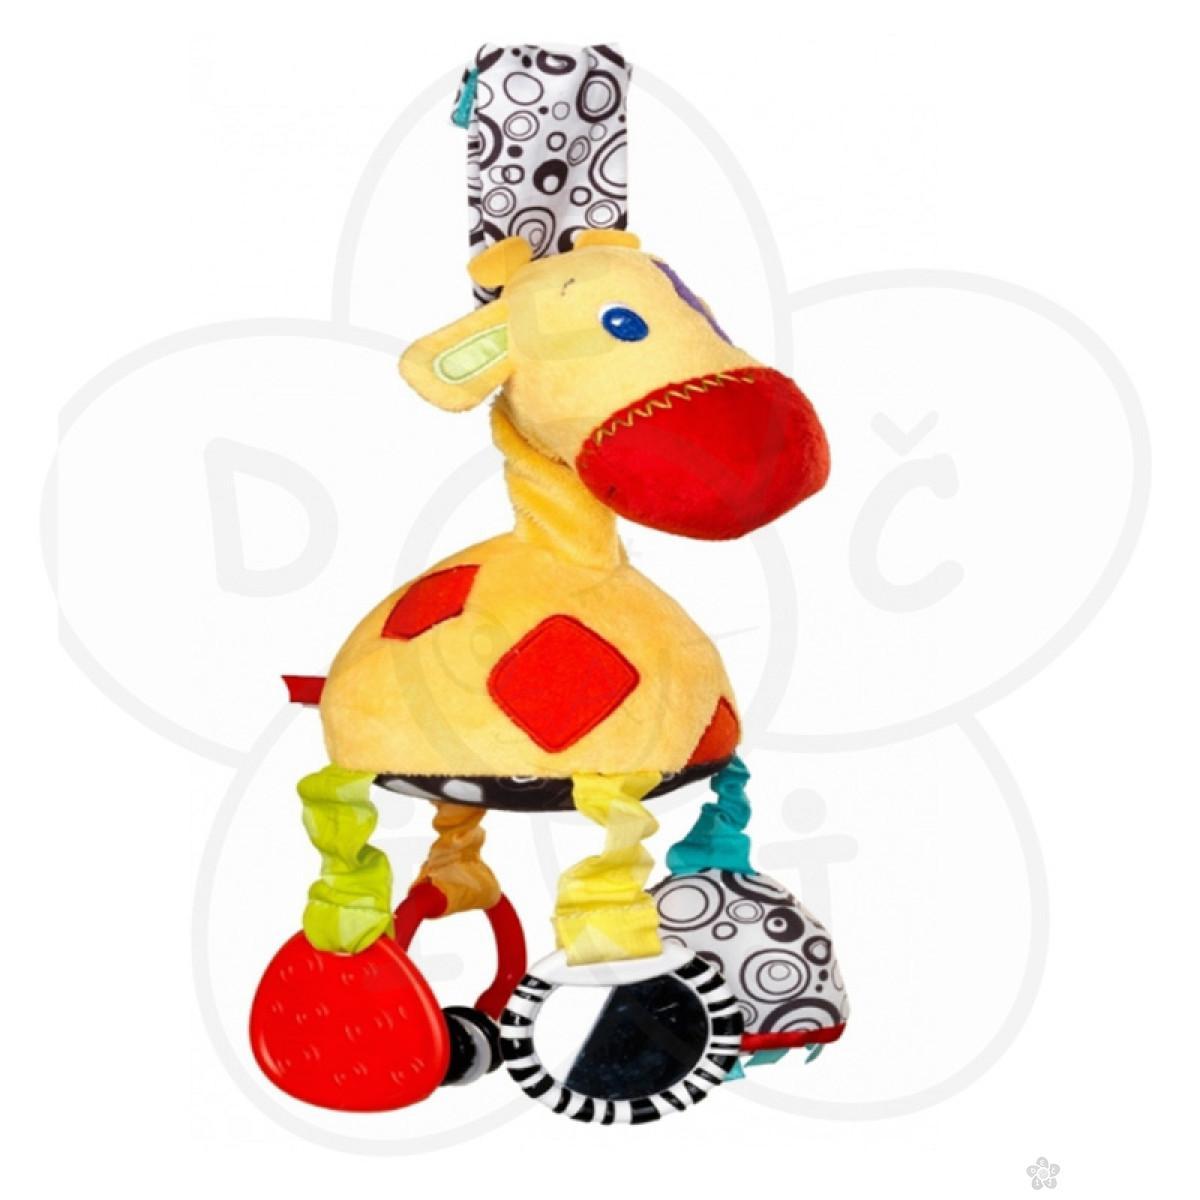 Igračke za bebe - zvečka glodalica žirafa